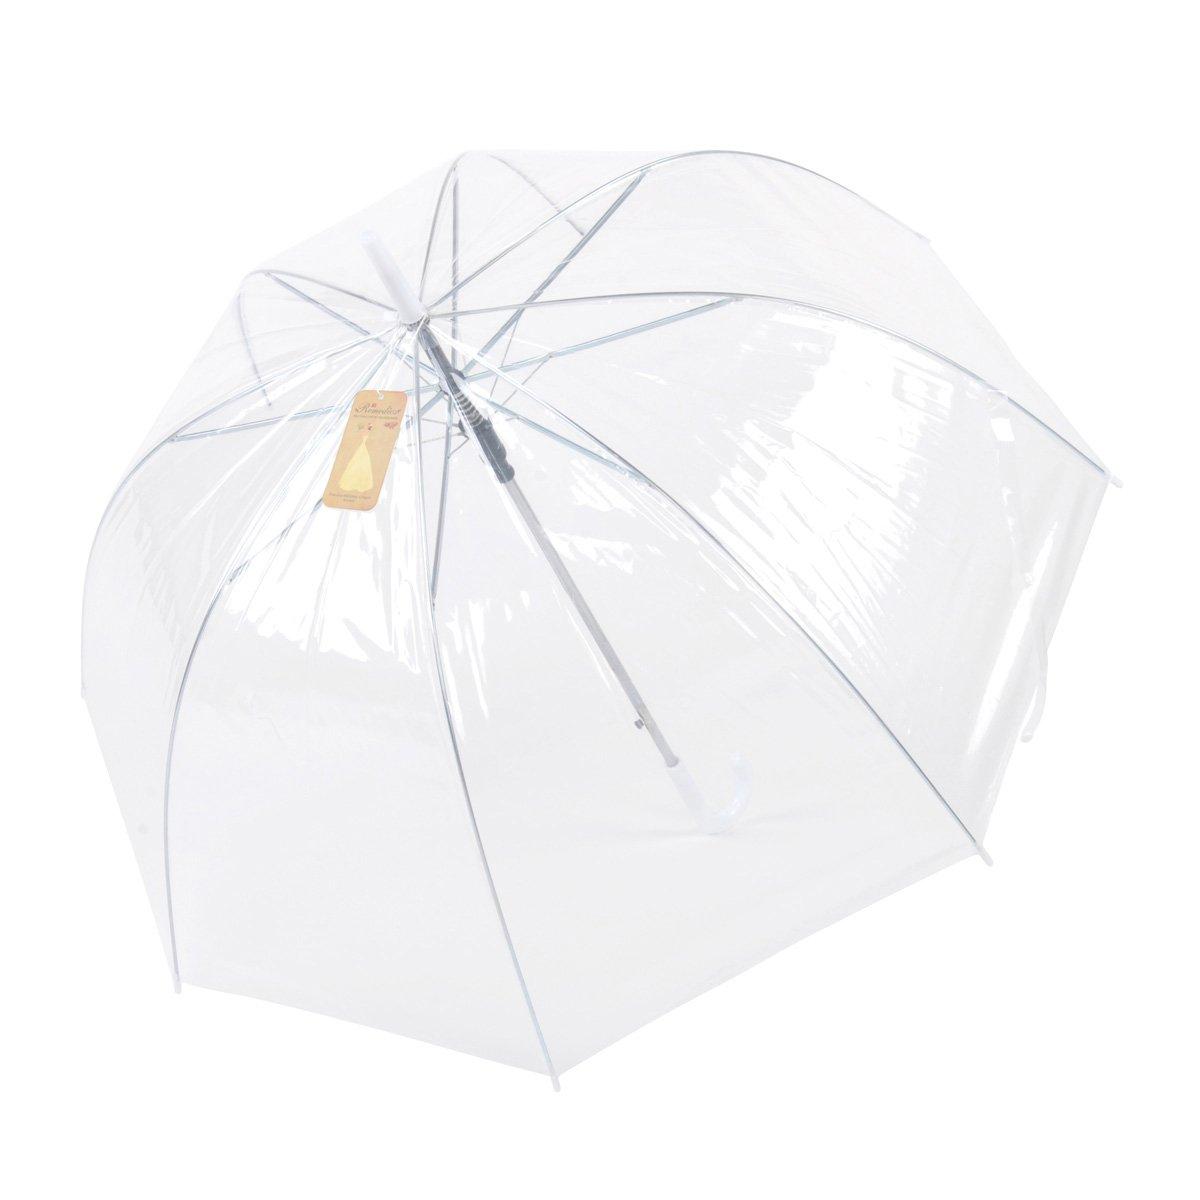 Topwedding Women's Dome Clear Transparent Automatic Rain Umbrella Parasol for Favor